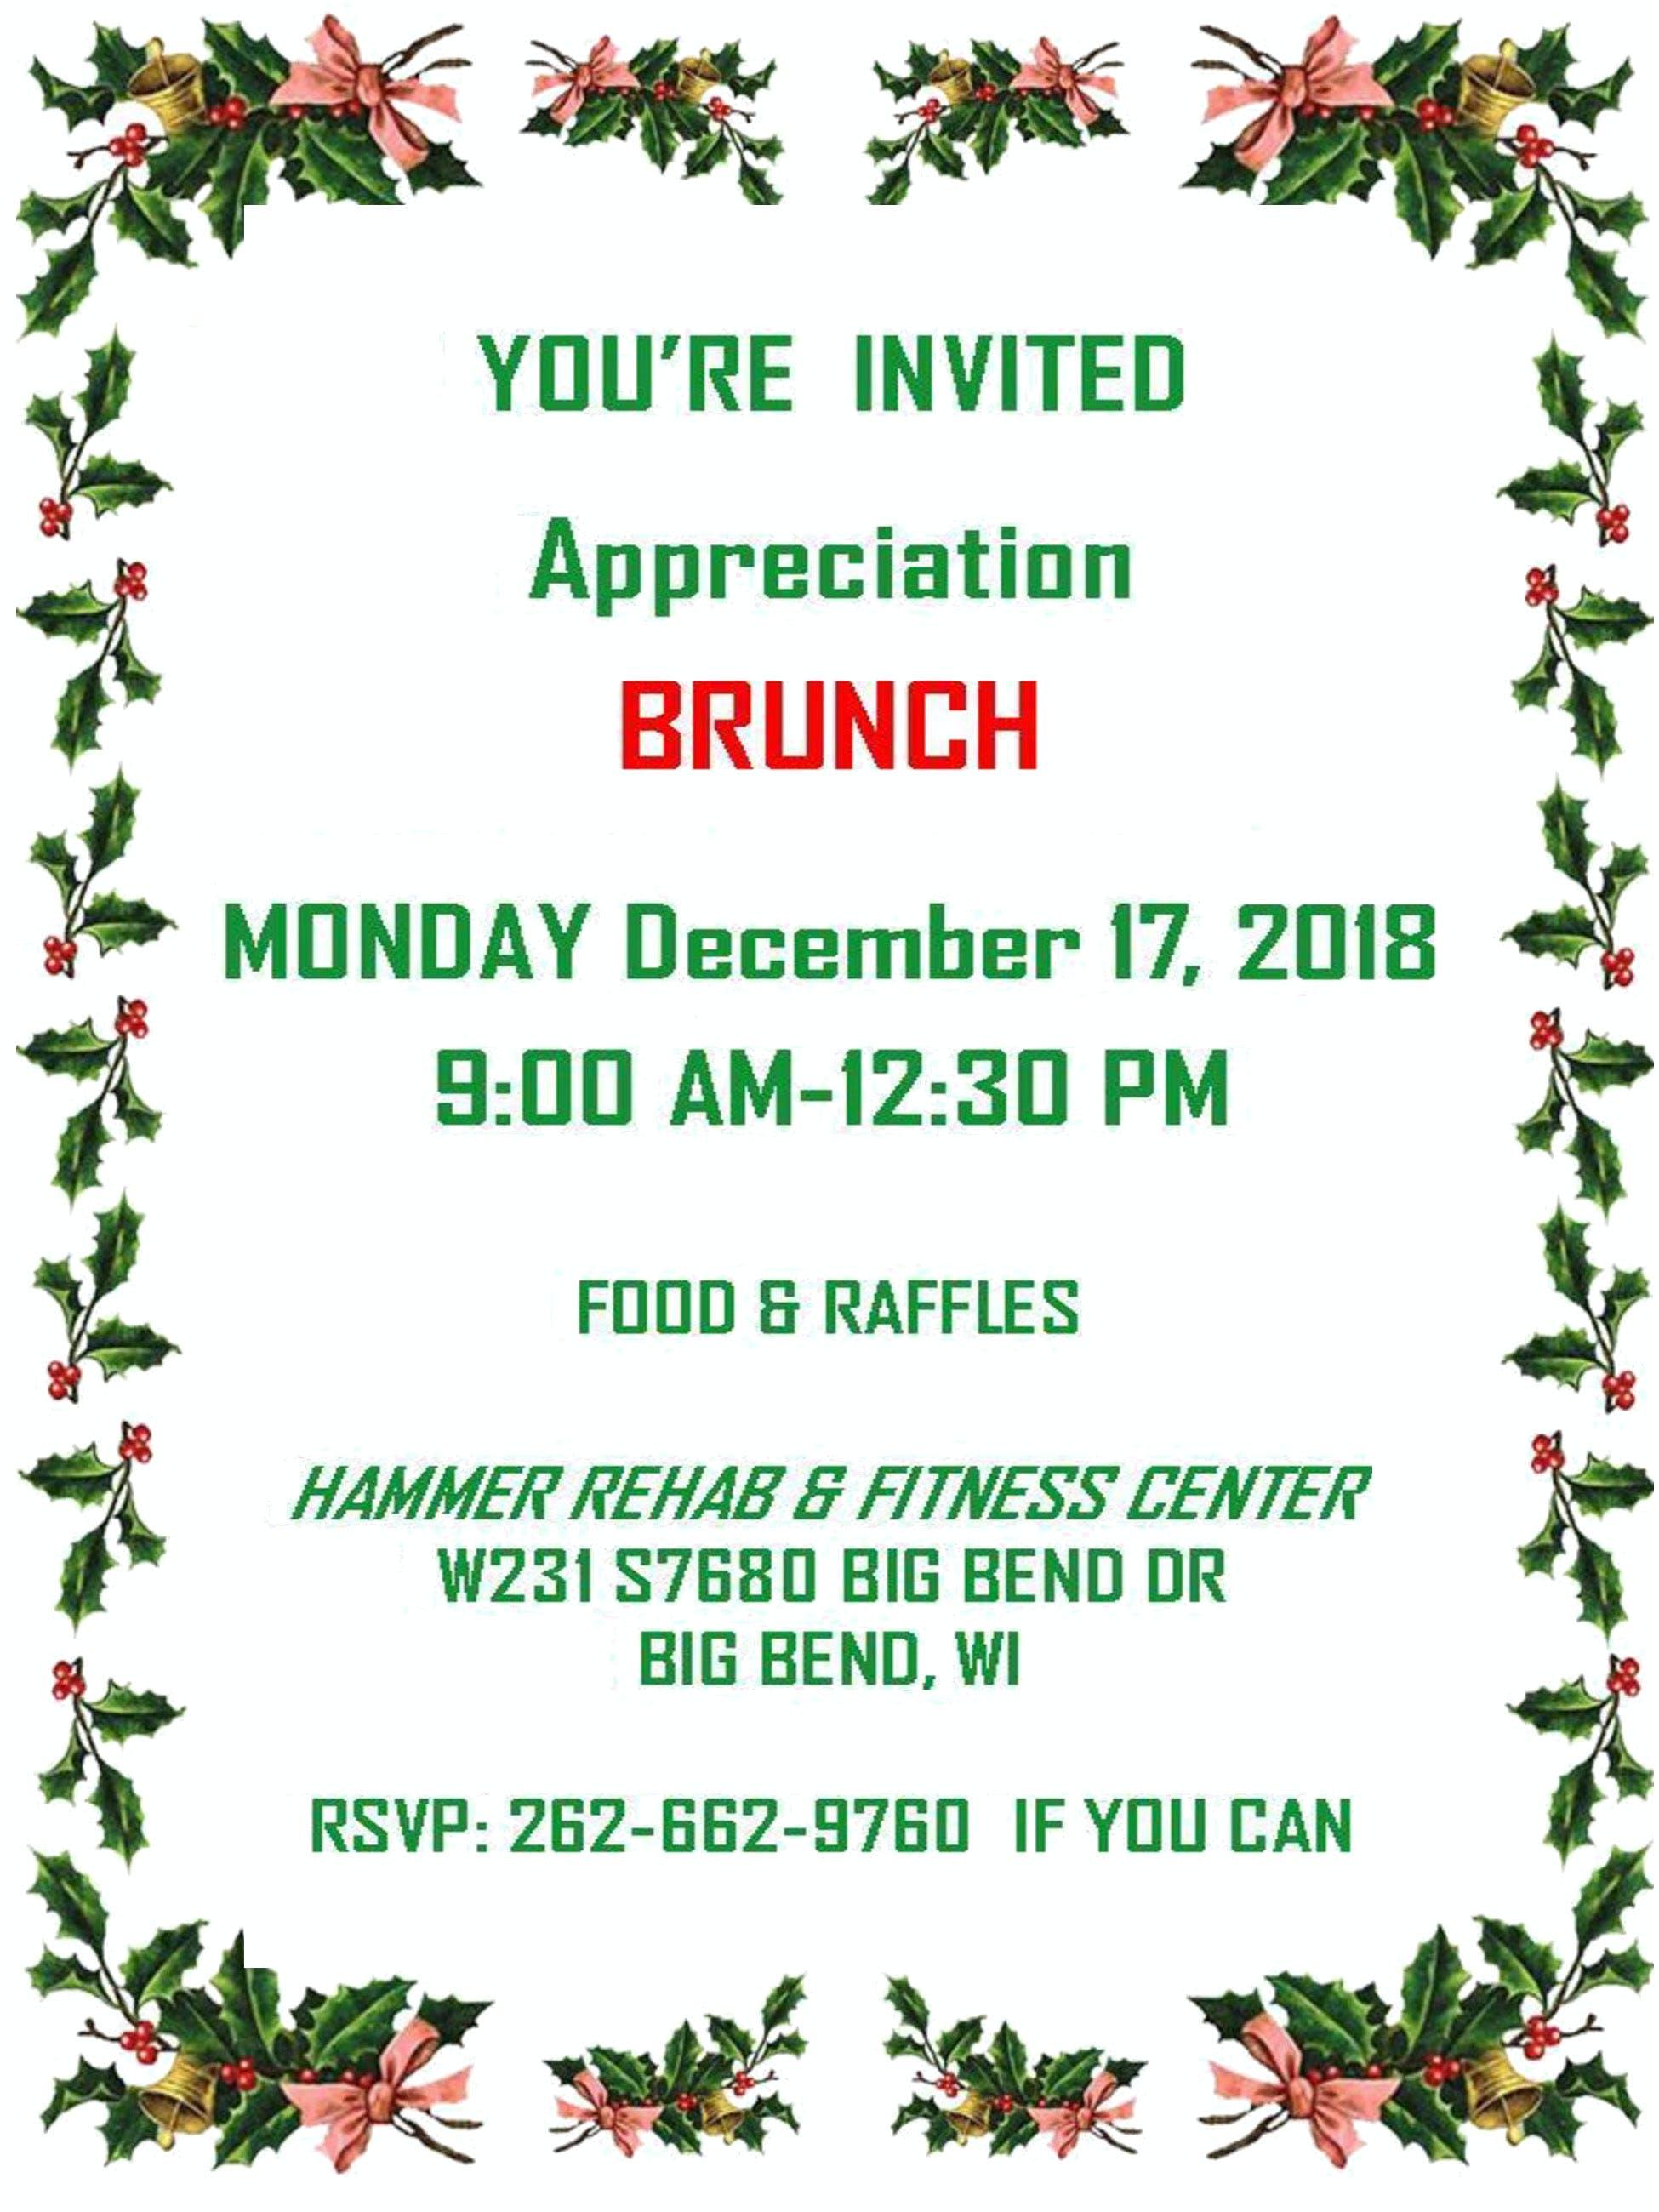 Appreciation Brunch | Monday, Dec. 17, 2018 from 9am-12:30pm | Food & Raffles | Hammer Rehab & Fitness Center | W231 S7680 Big Bend Dr | Big Bend, WI | RSVP: 262-662-9760